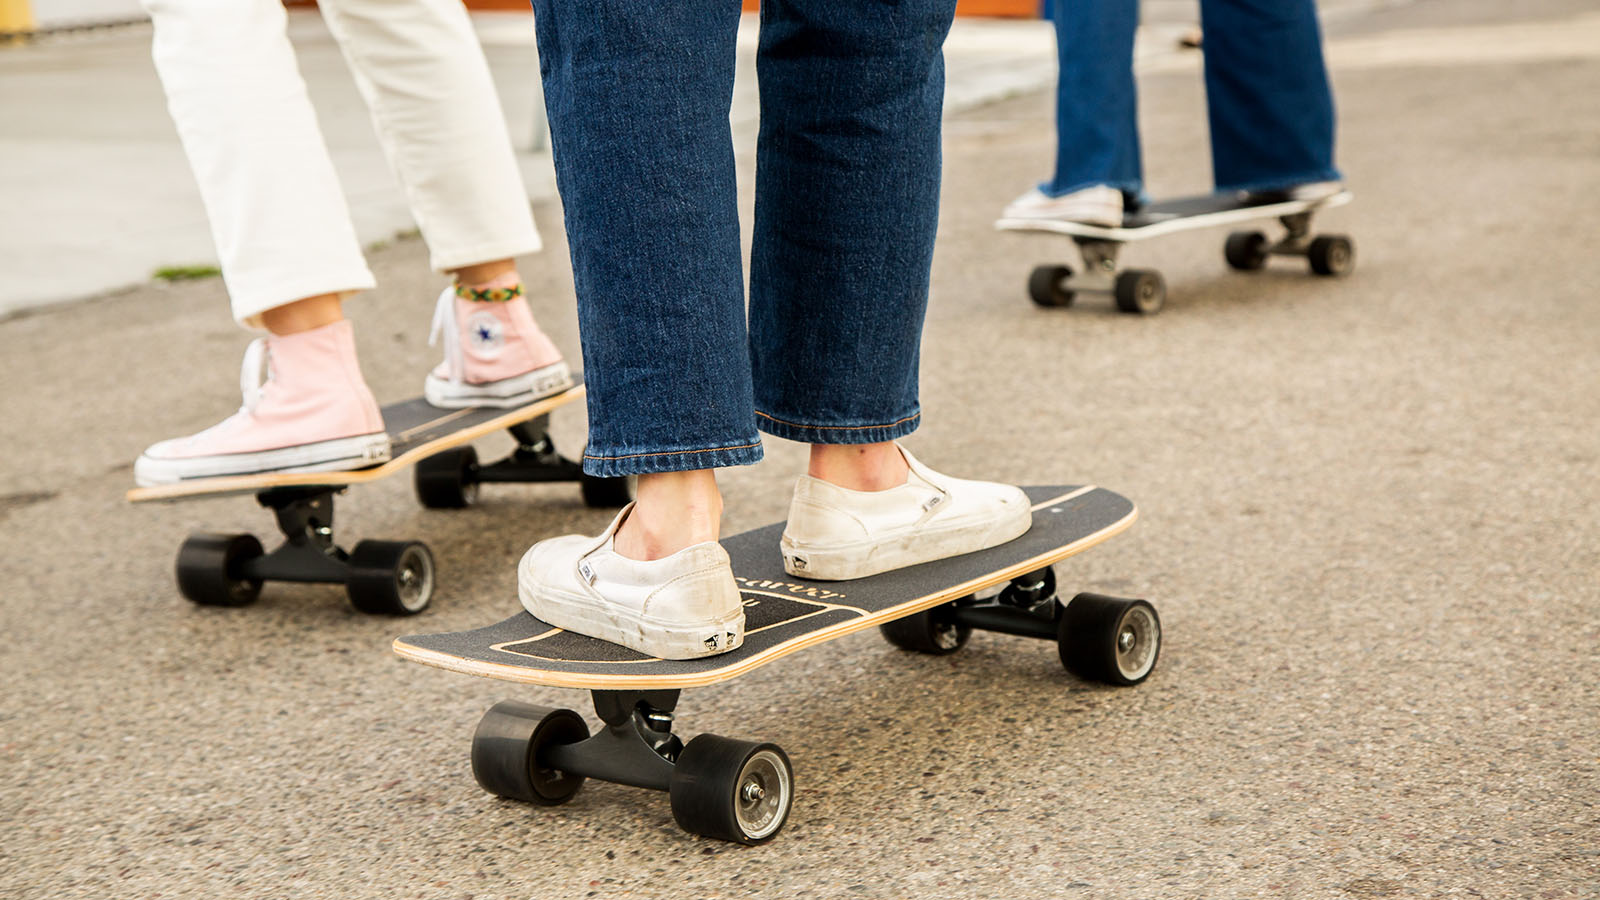 Carver Skateboards SS20 Surfskate Preview